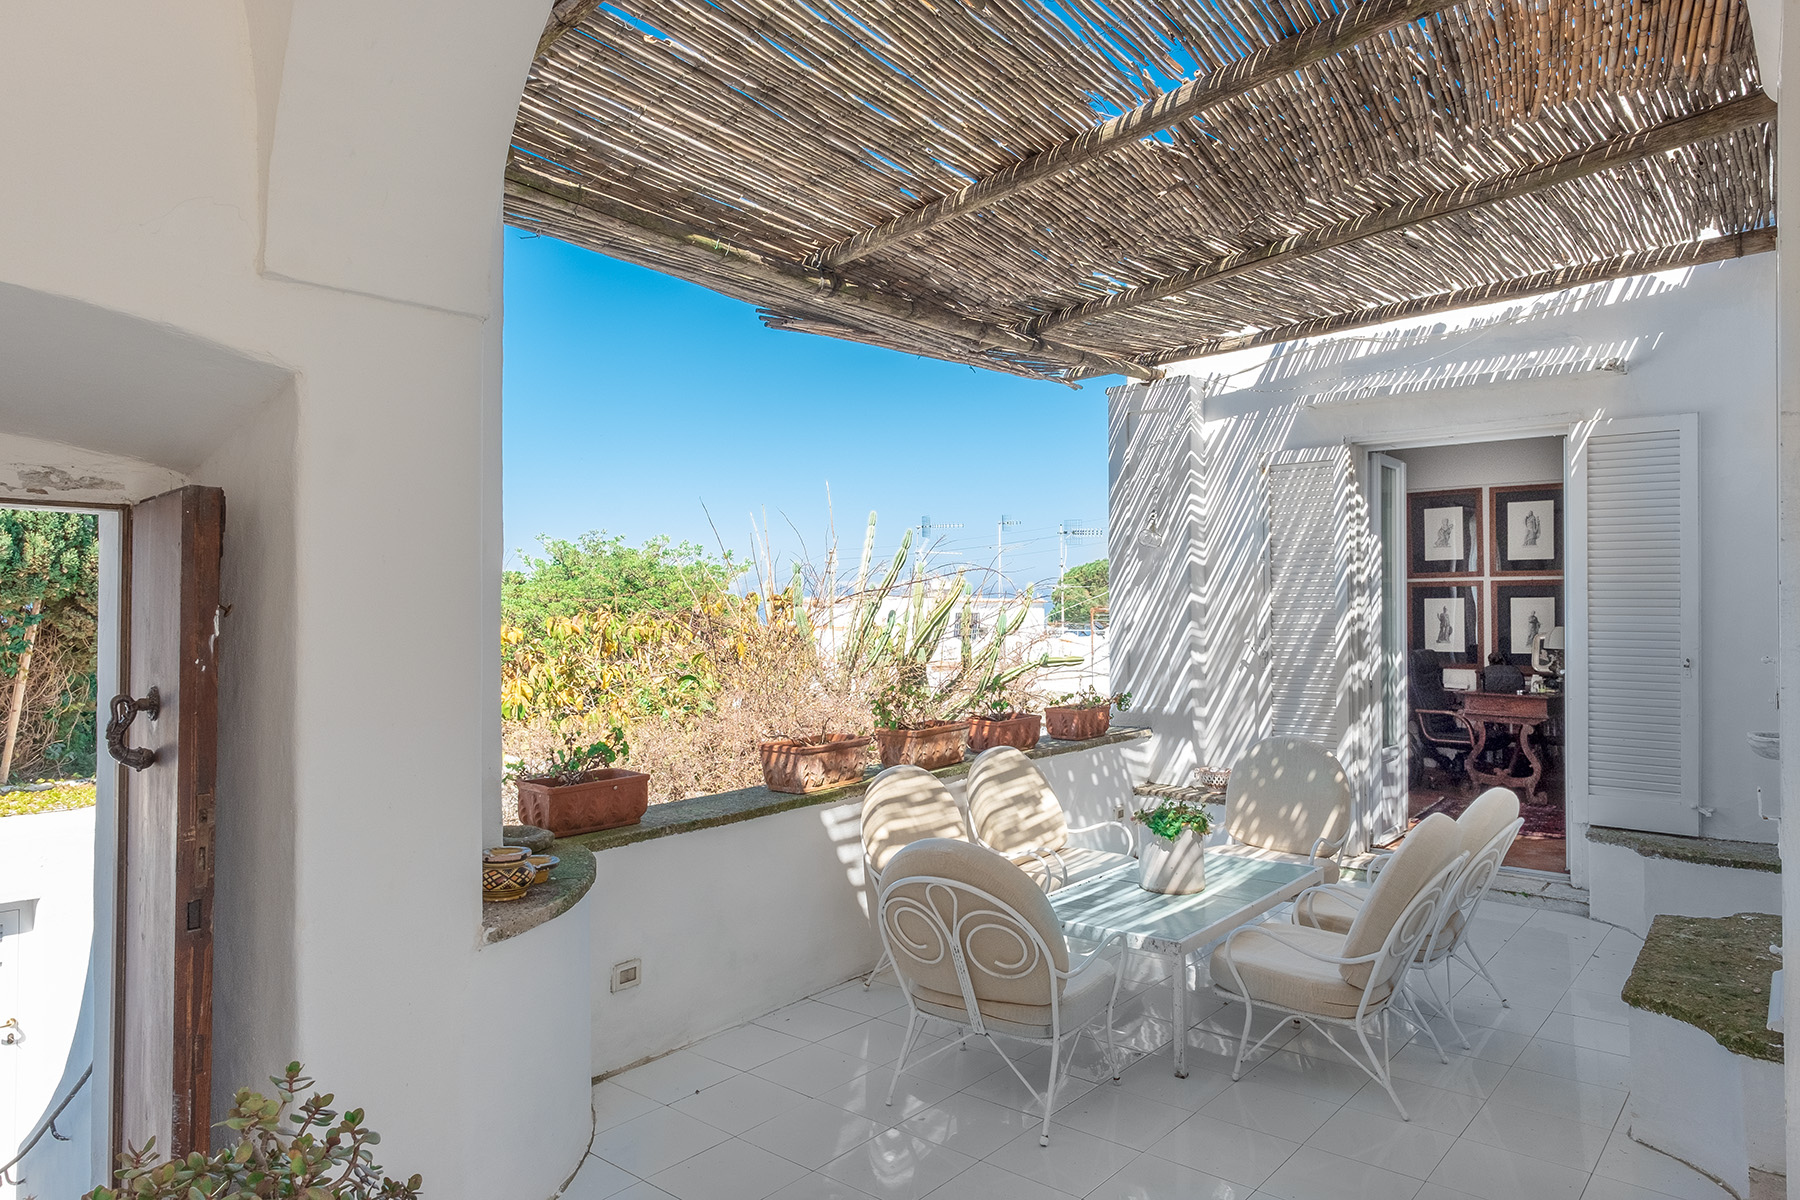 Casa indipendente in Vendita a Capri: 5 locali, 300 mq - Foto 8